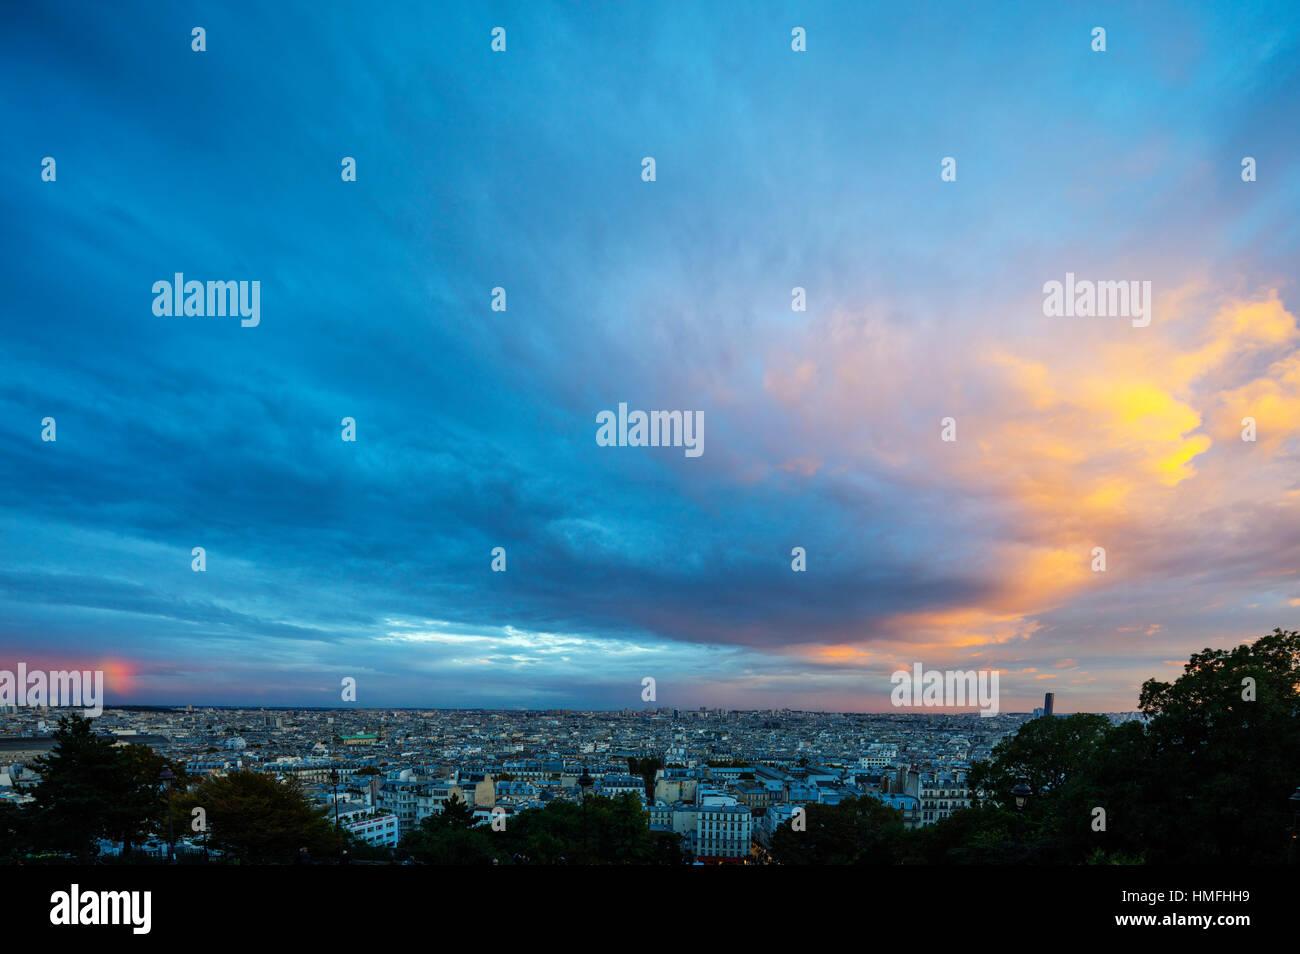 City skyline from Montmartre, Paris, France - Stock Image